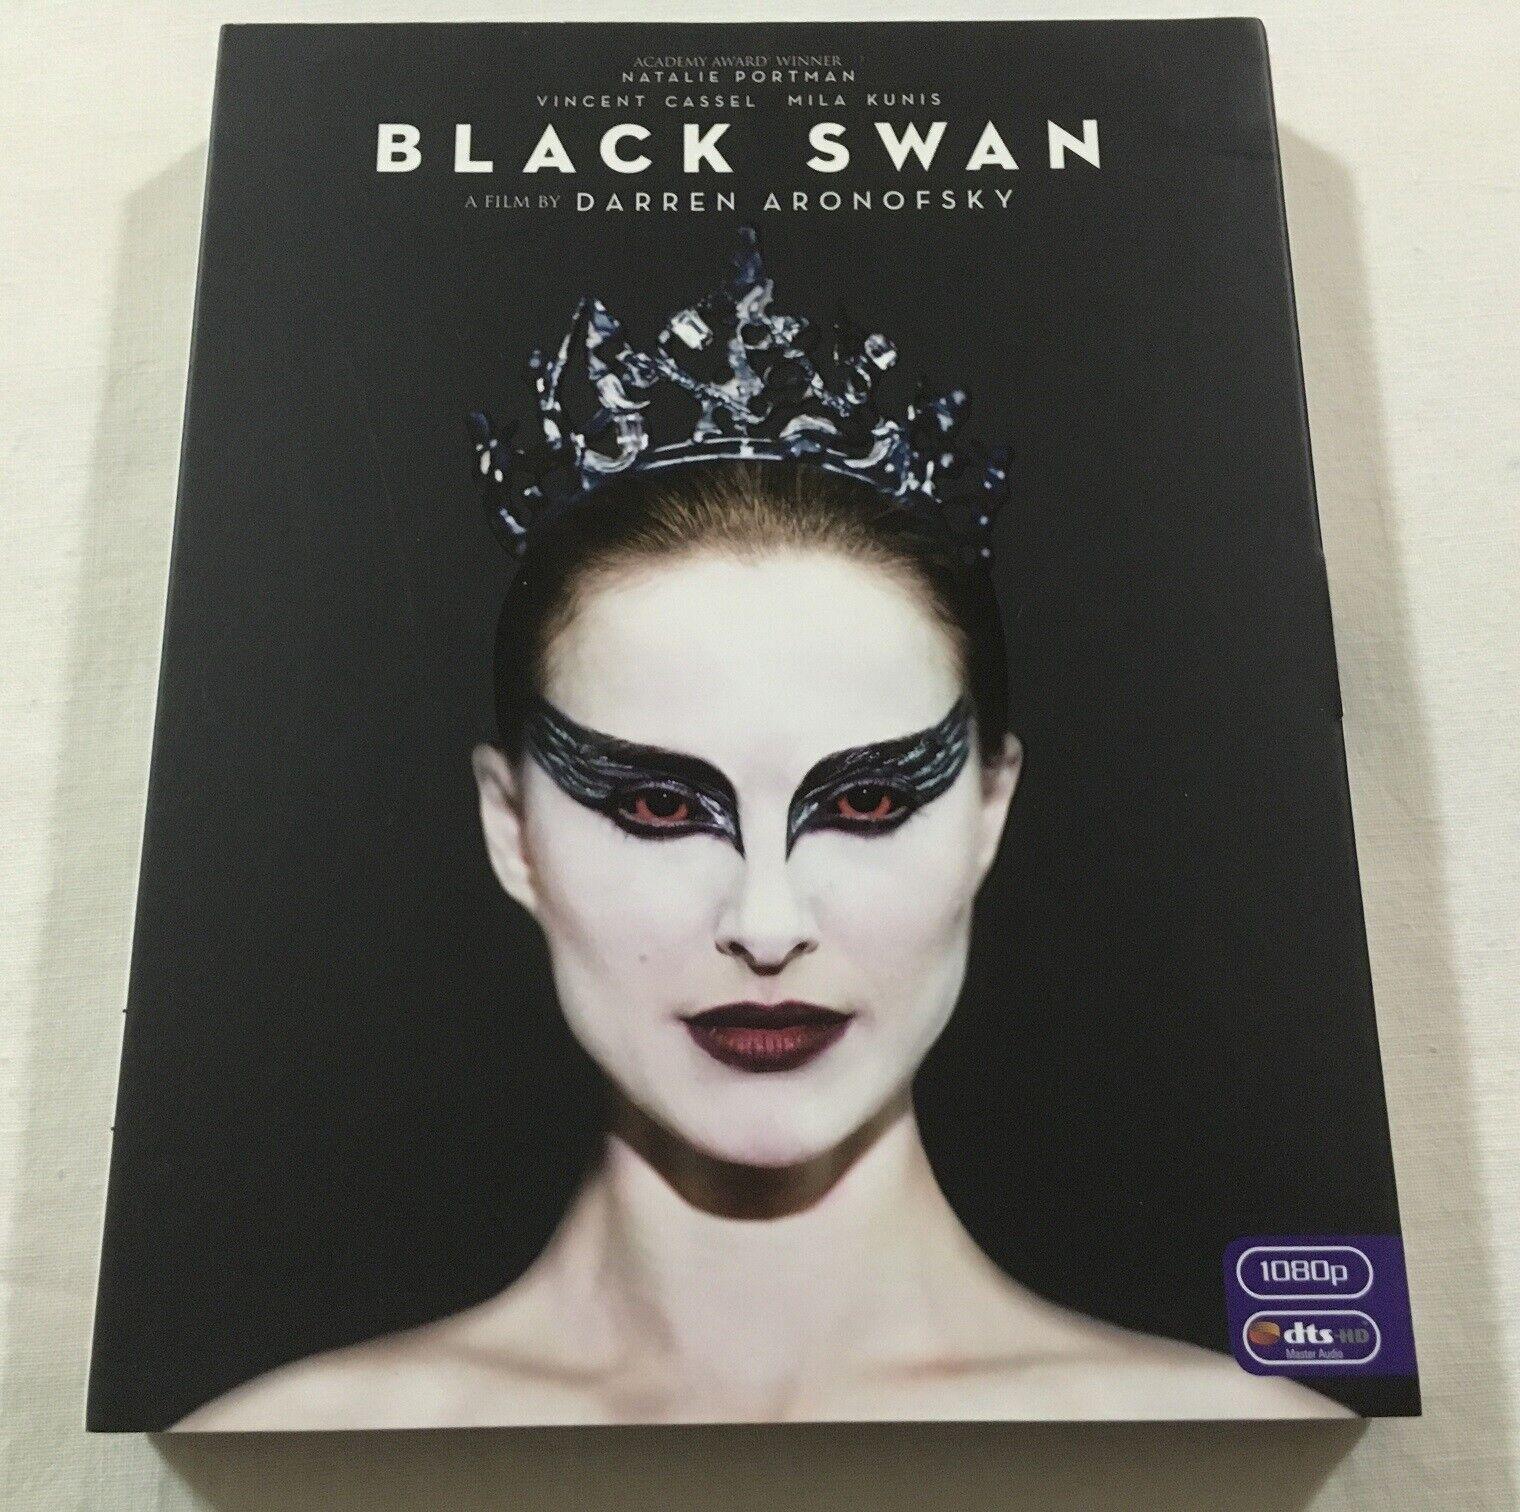 Black Swan 2010 Jb Hi Fi Exclusive Slipcover Blu Ray Dvd Region B 4 Vgc For Sale Online